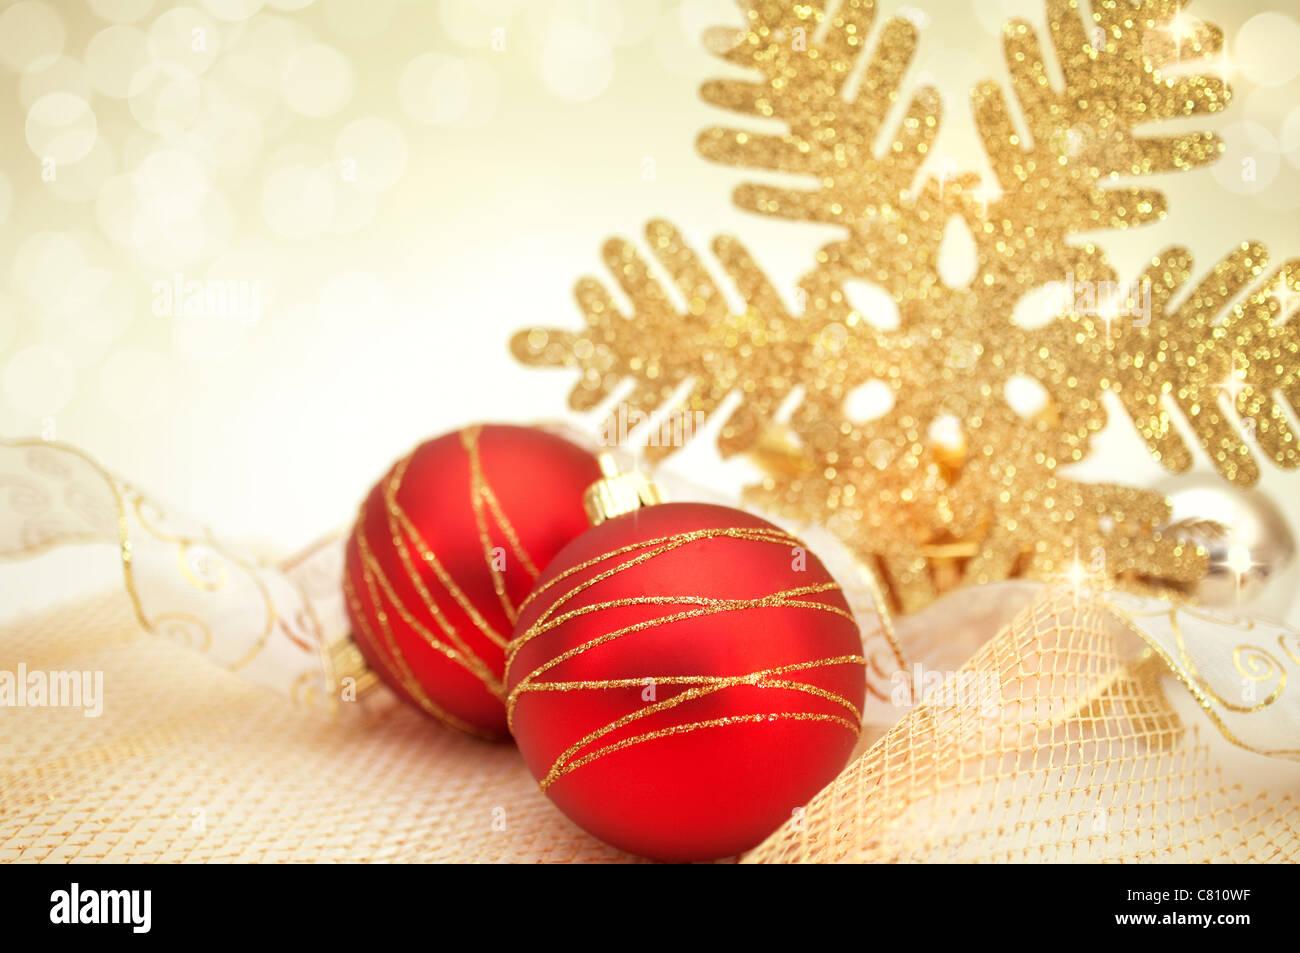 Beautiful Christmas Background Images.Beautiful Christmas Background With Decoration In Gold And